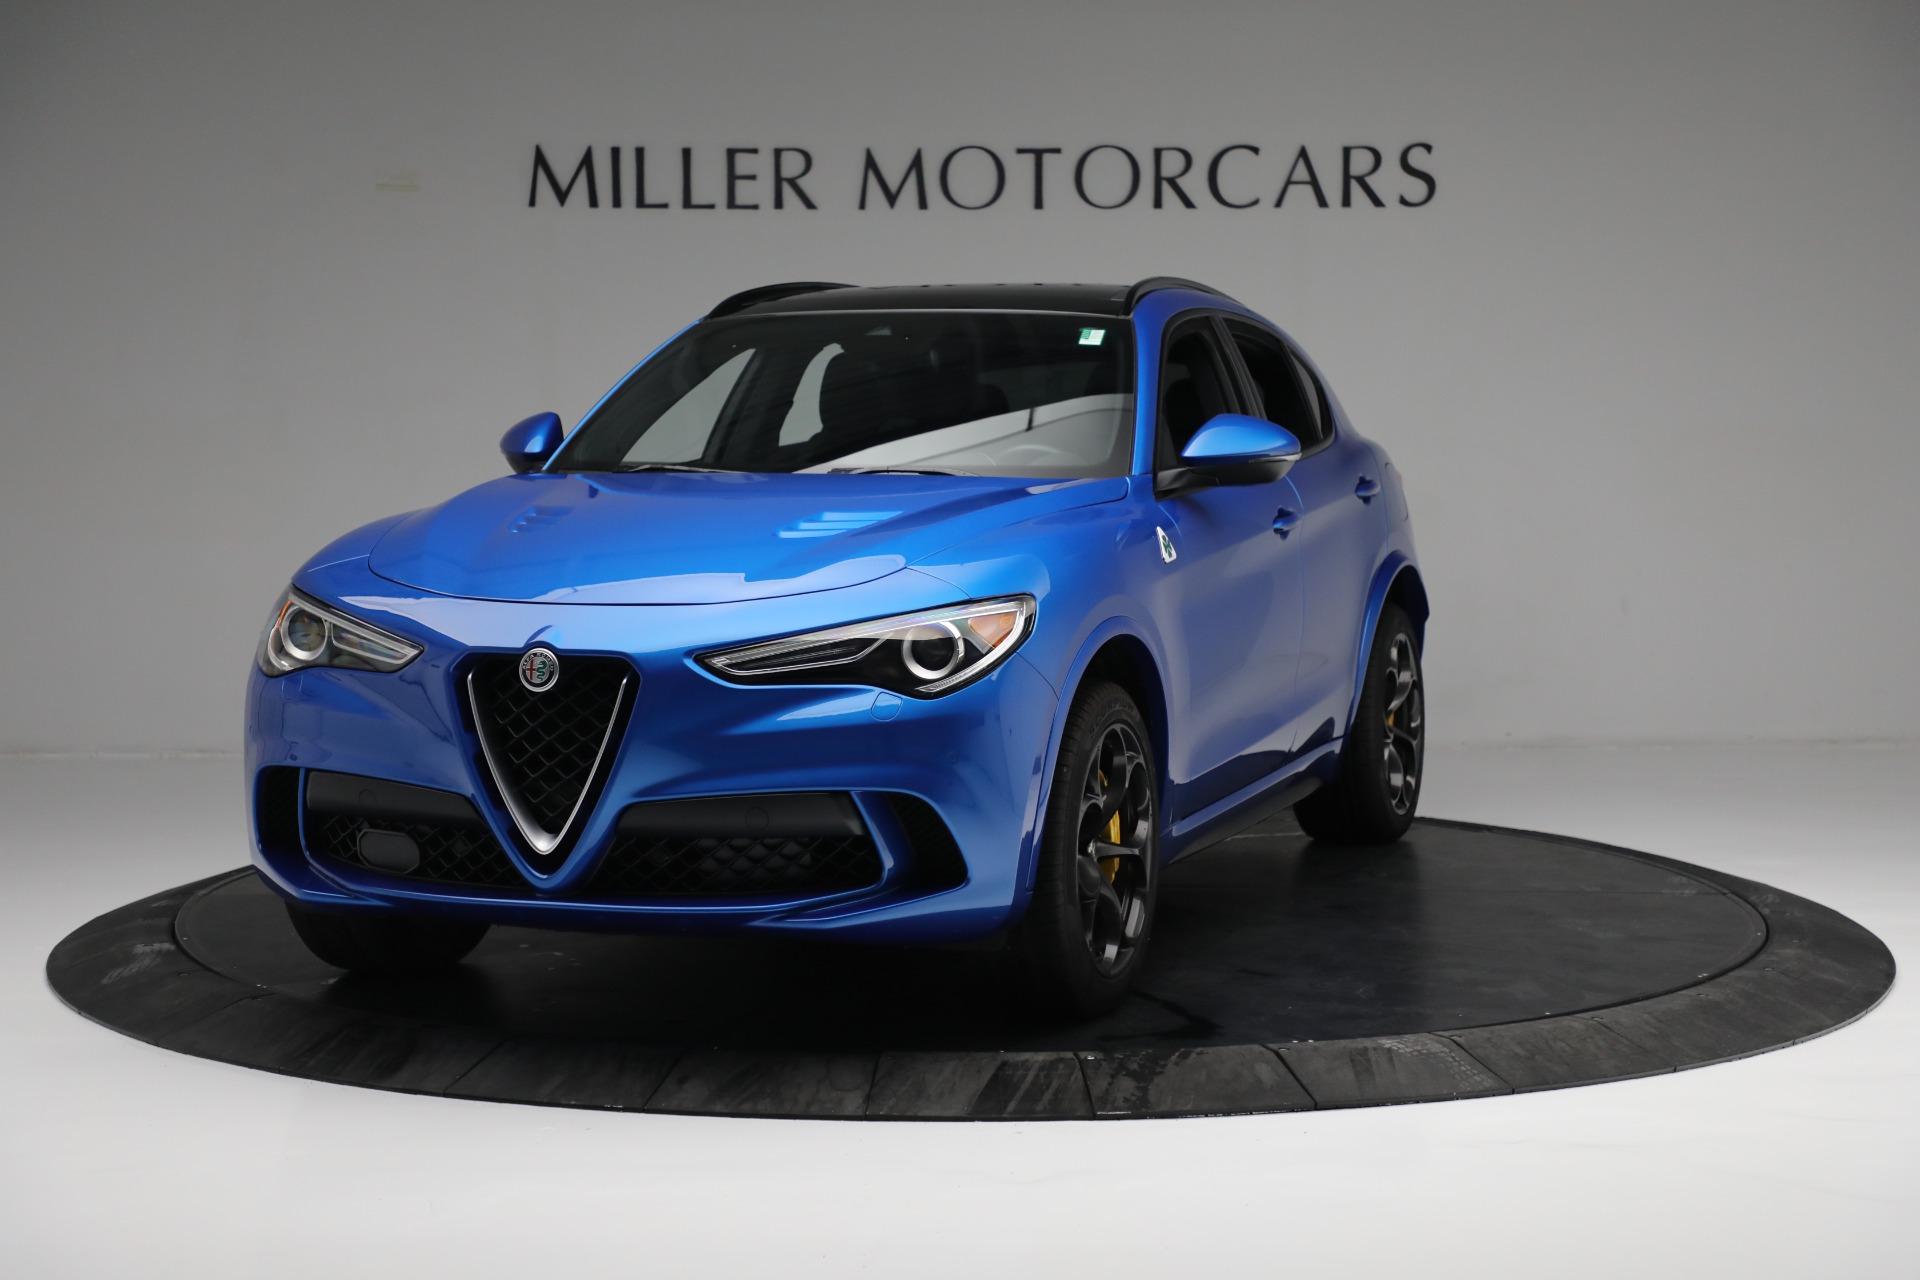 New 2019 Alfa Romeo Stelvio Quadrifoglio for sale Sold at Rolls-Royce Motor Cars Greenwich in Greenwich CT 06830 1